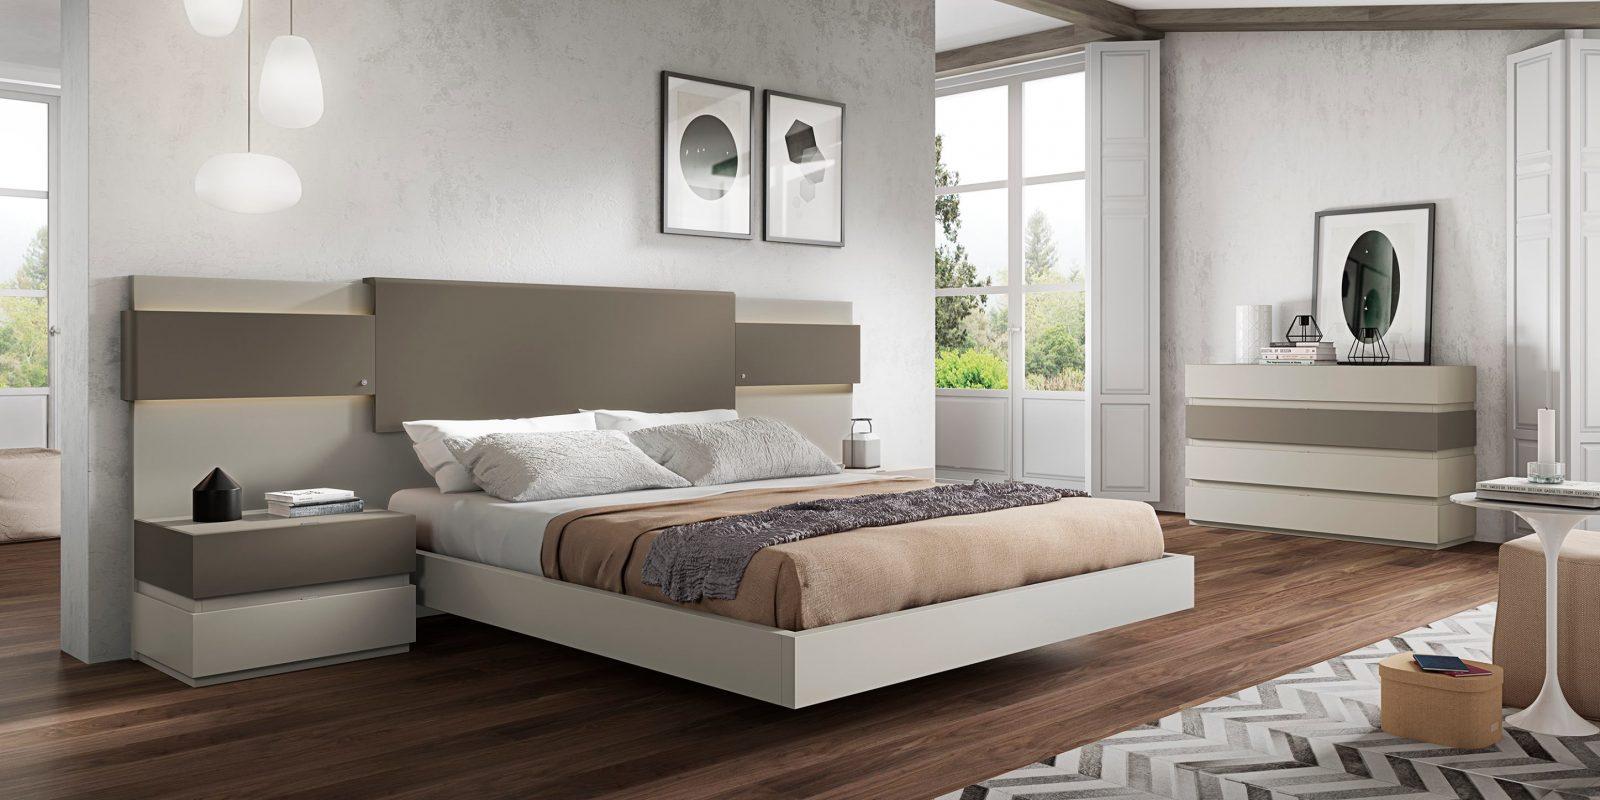 Dormitorios nexo mobiliario hd for Mobiliario dormitorio